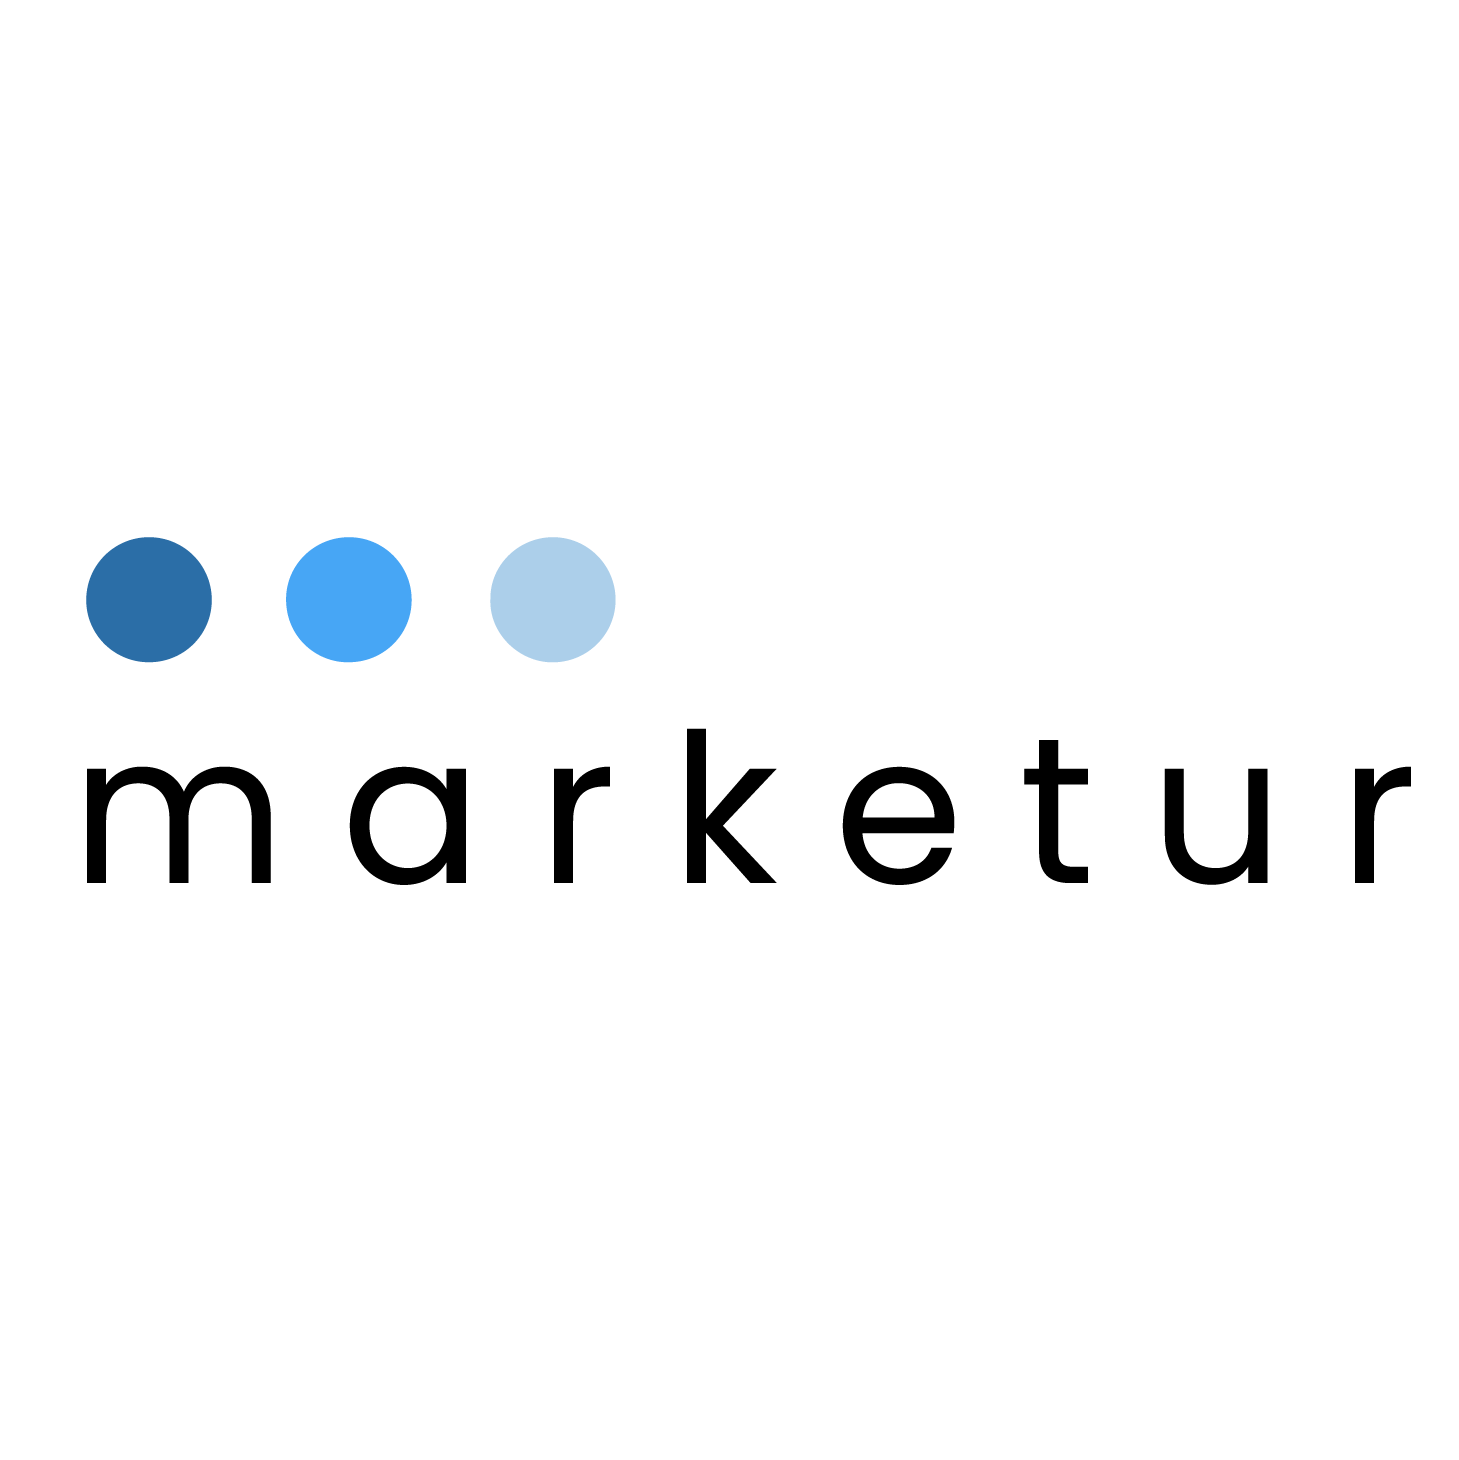 Marketur logo